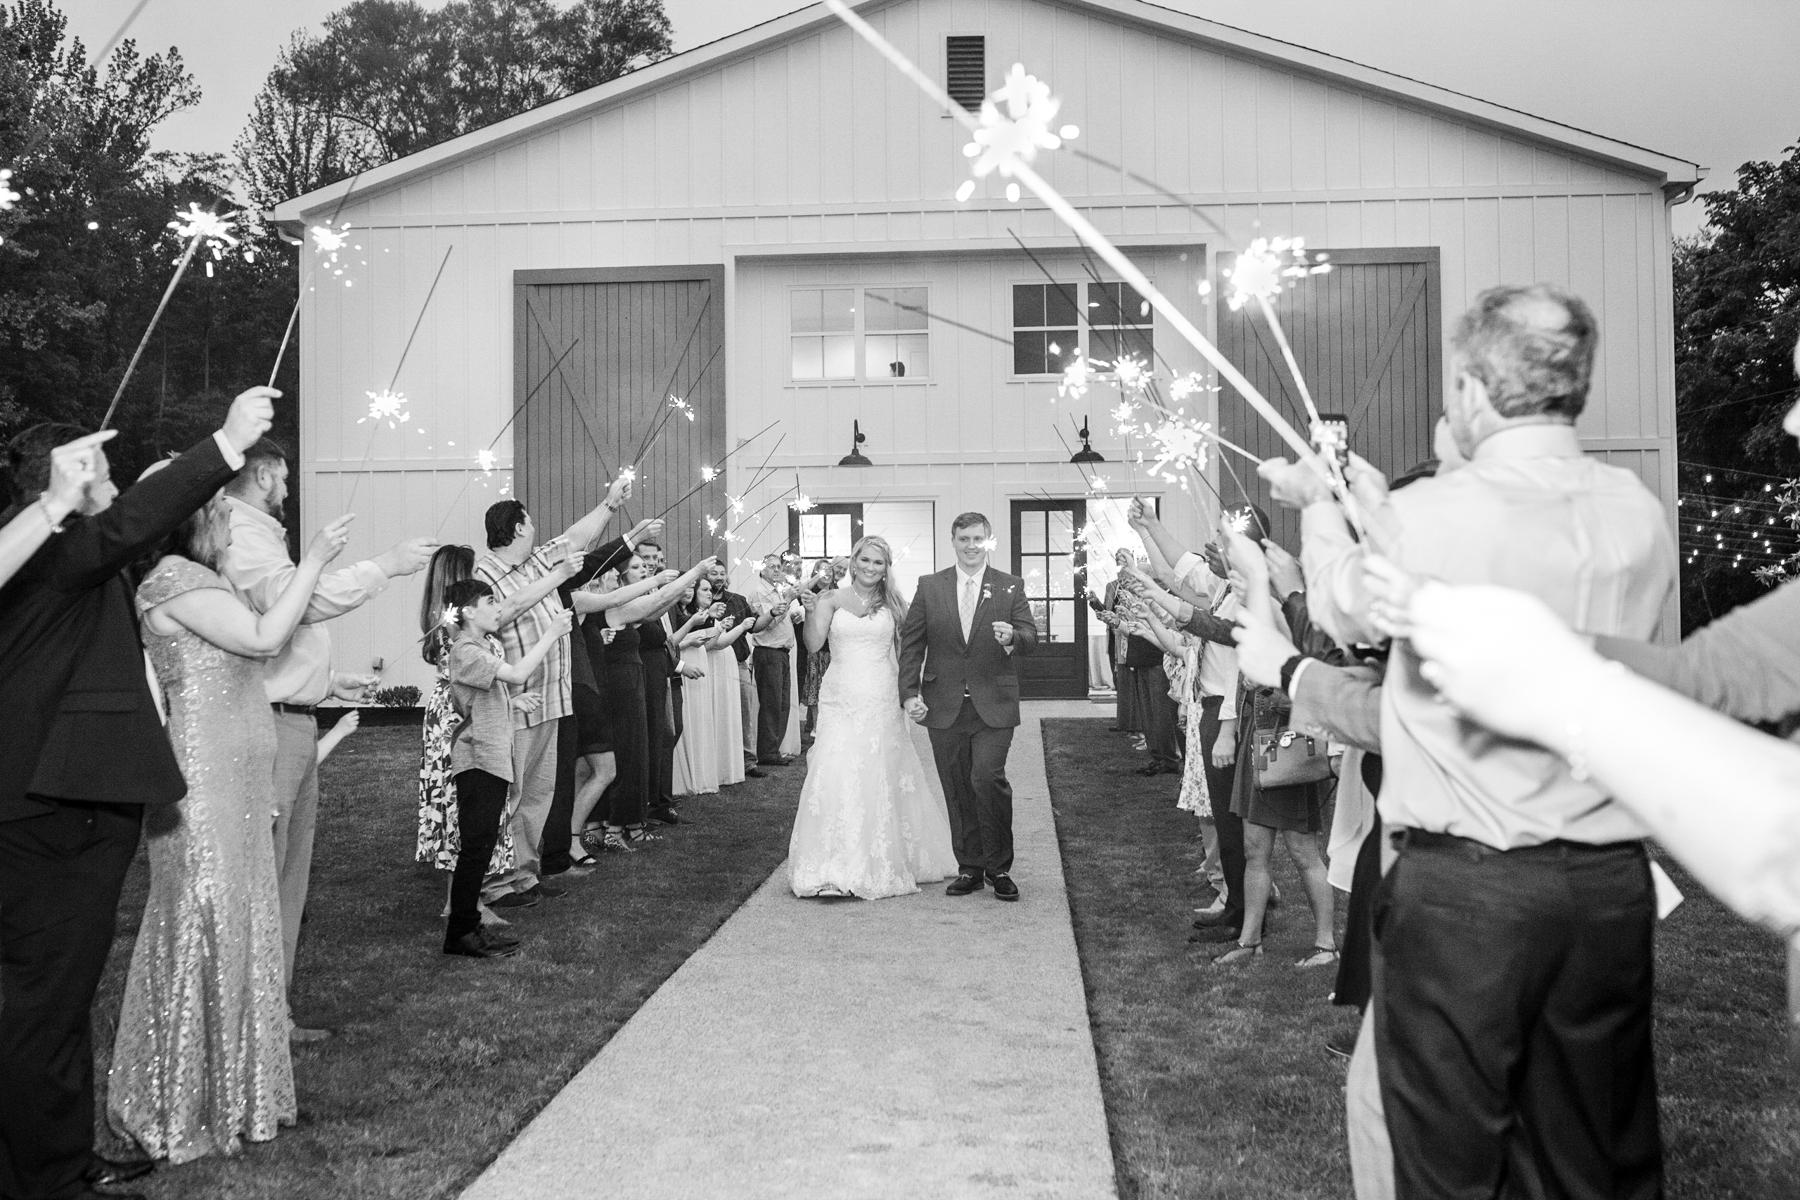 The-venue-at-white-oak-farms-wedding-nashville-wedding-photographers-0349.jpg